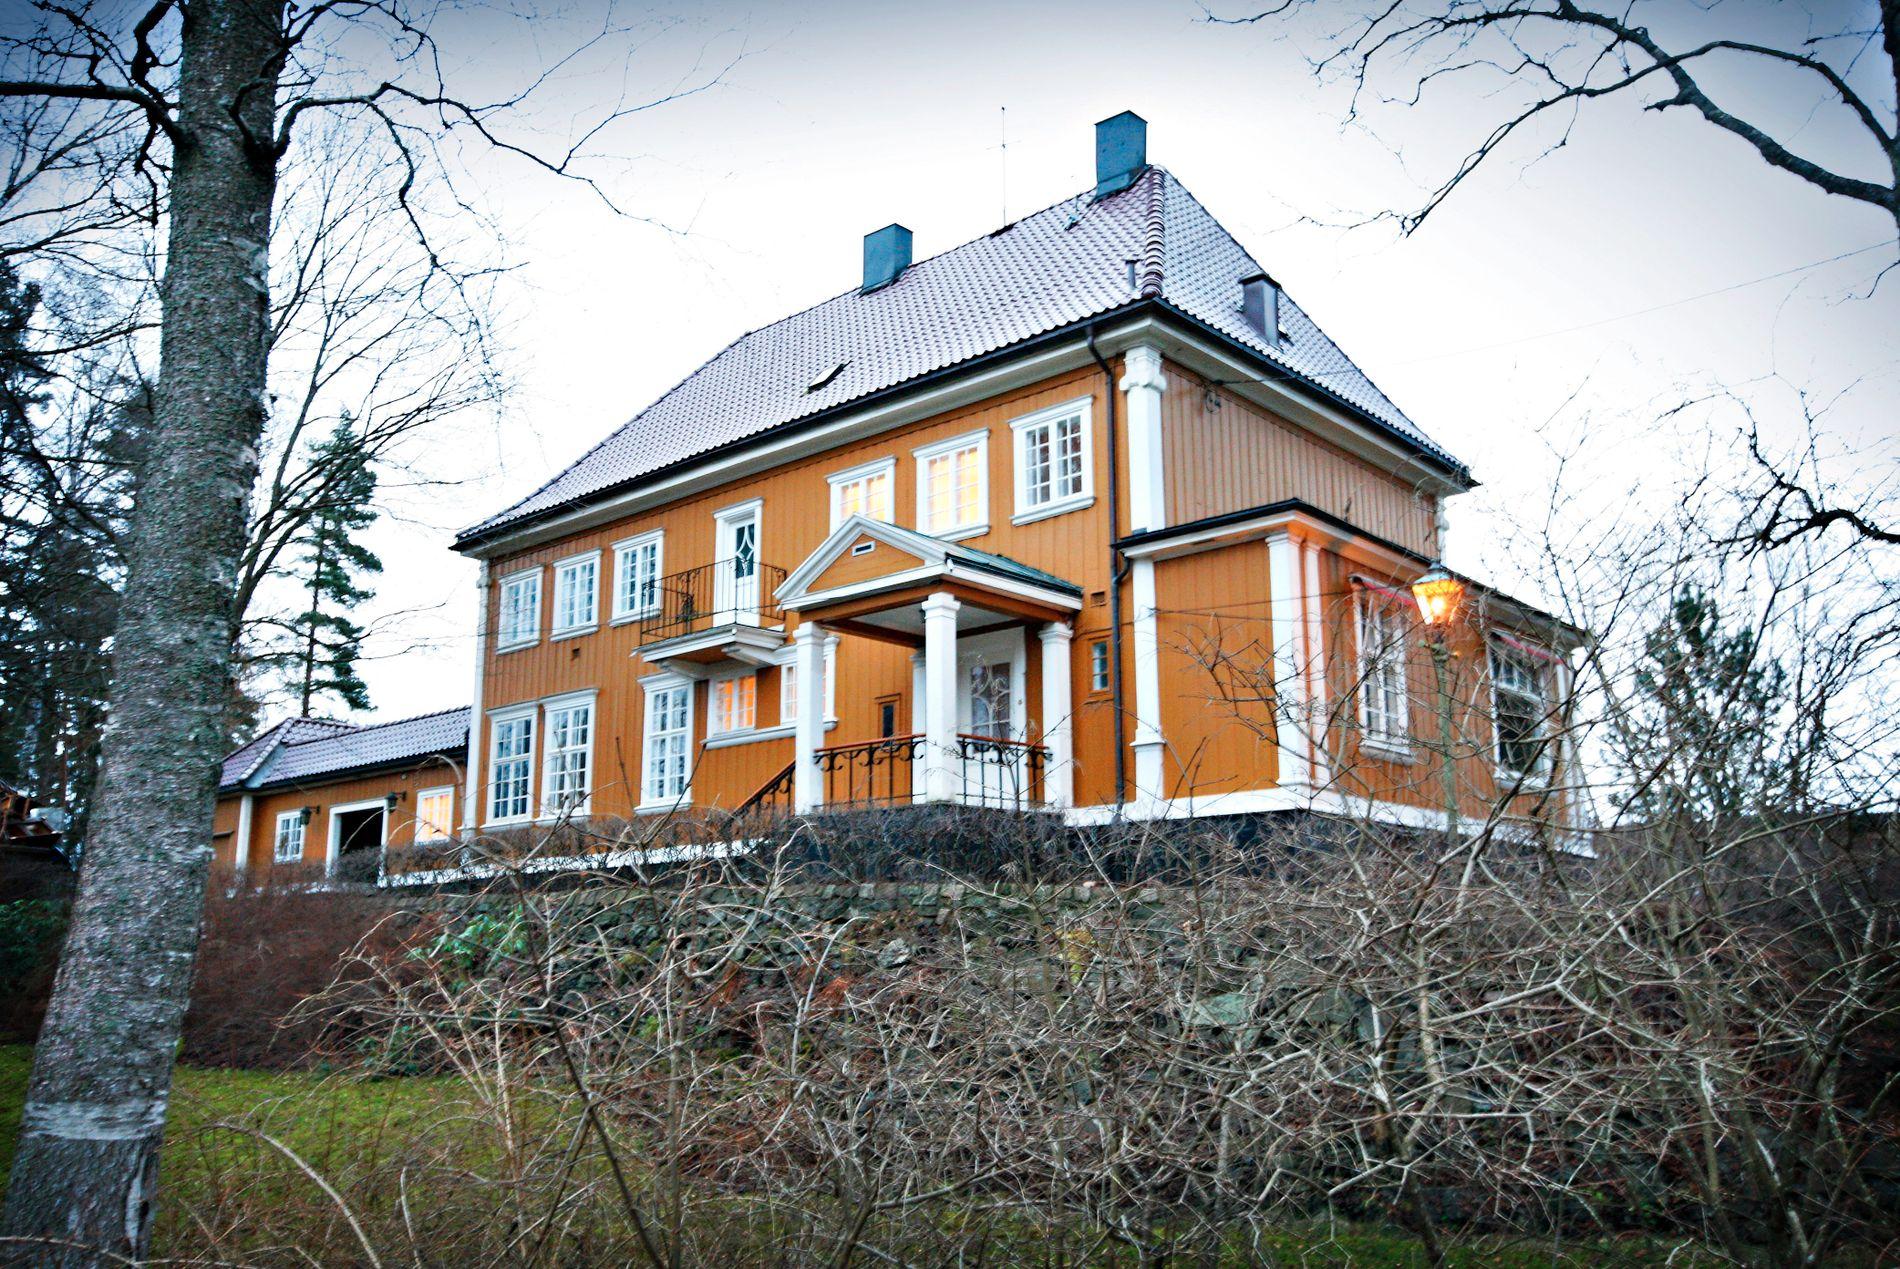 GRÅKAMVEIEN: Denne eneboligen på Slemdal i Oslo ble omtalt som årets trolig dyreste enebolig, da den ble solgt i 2011.